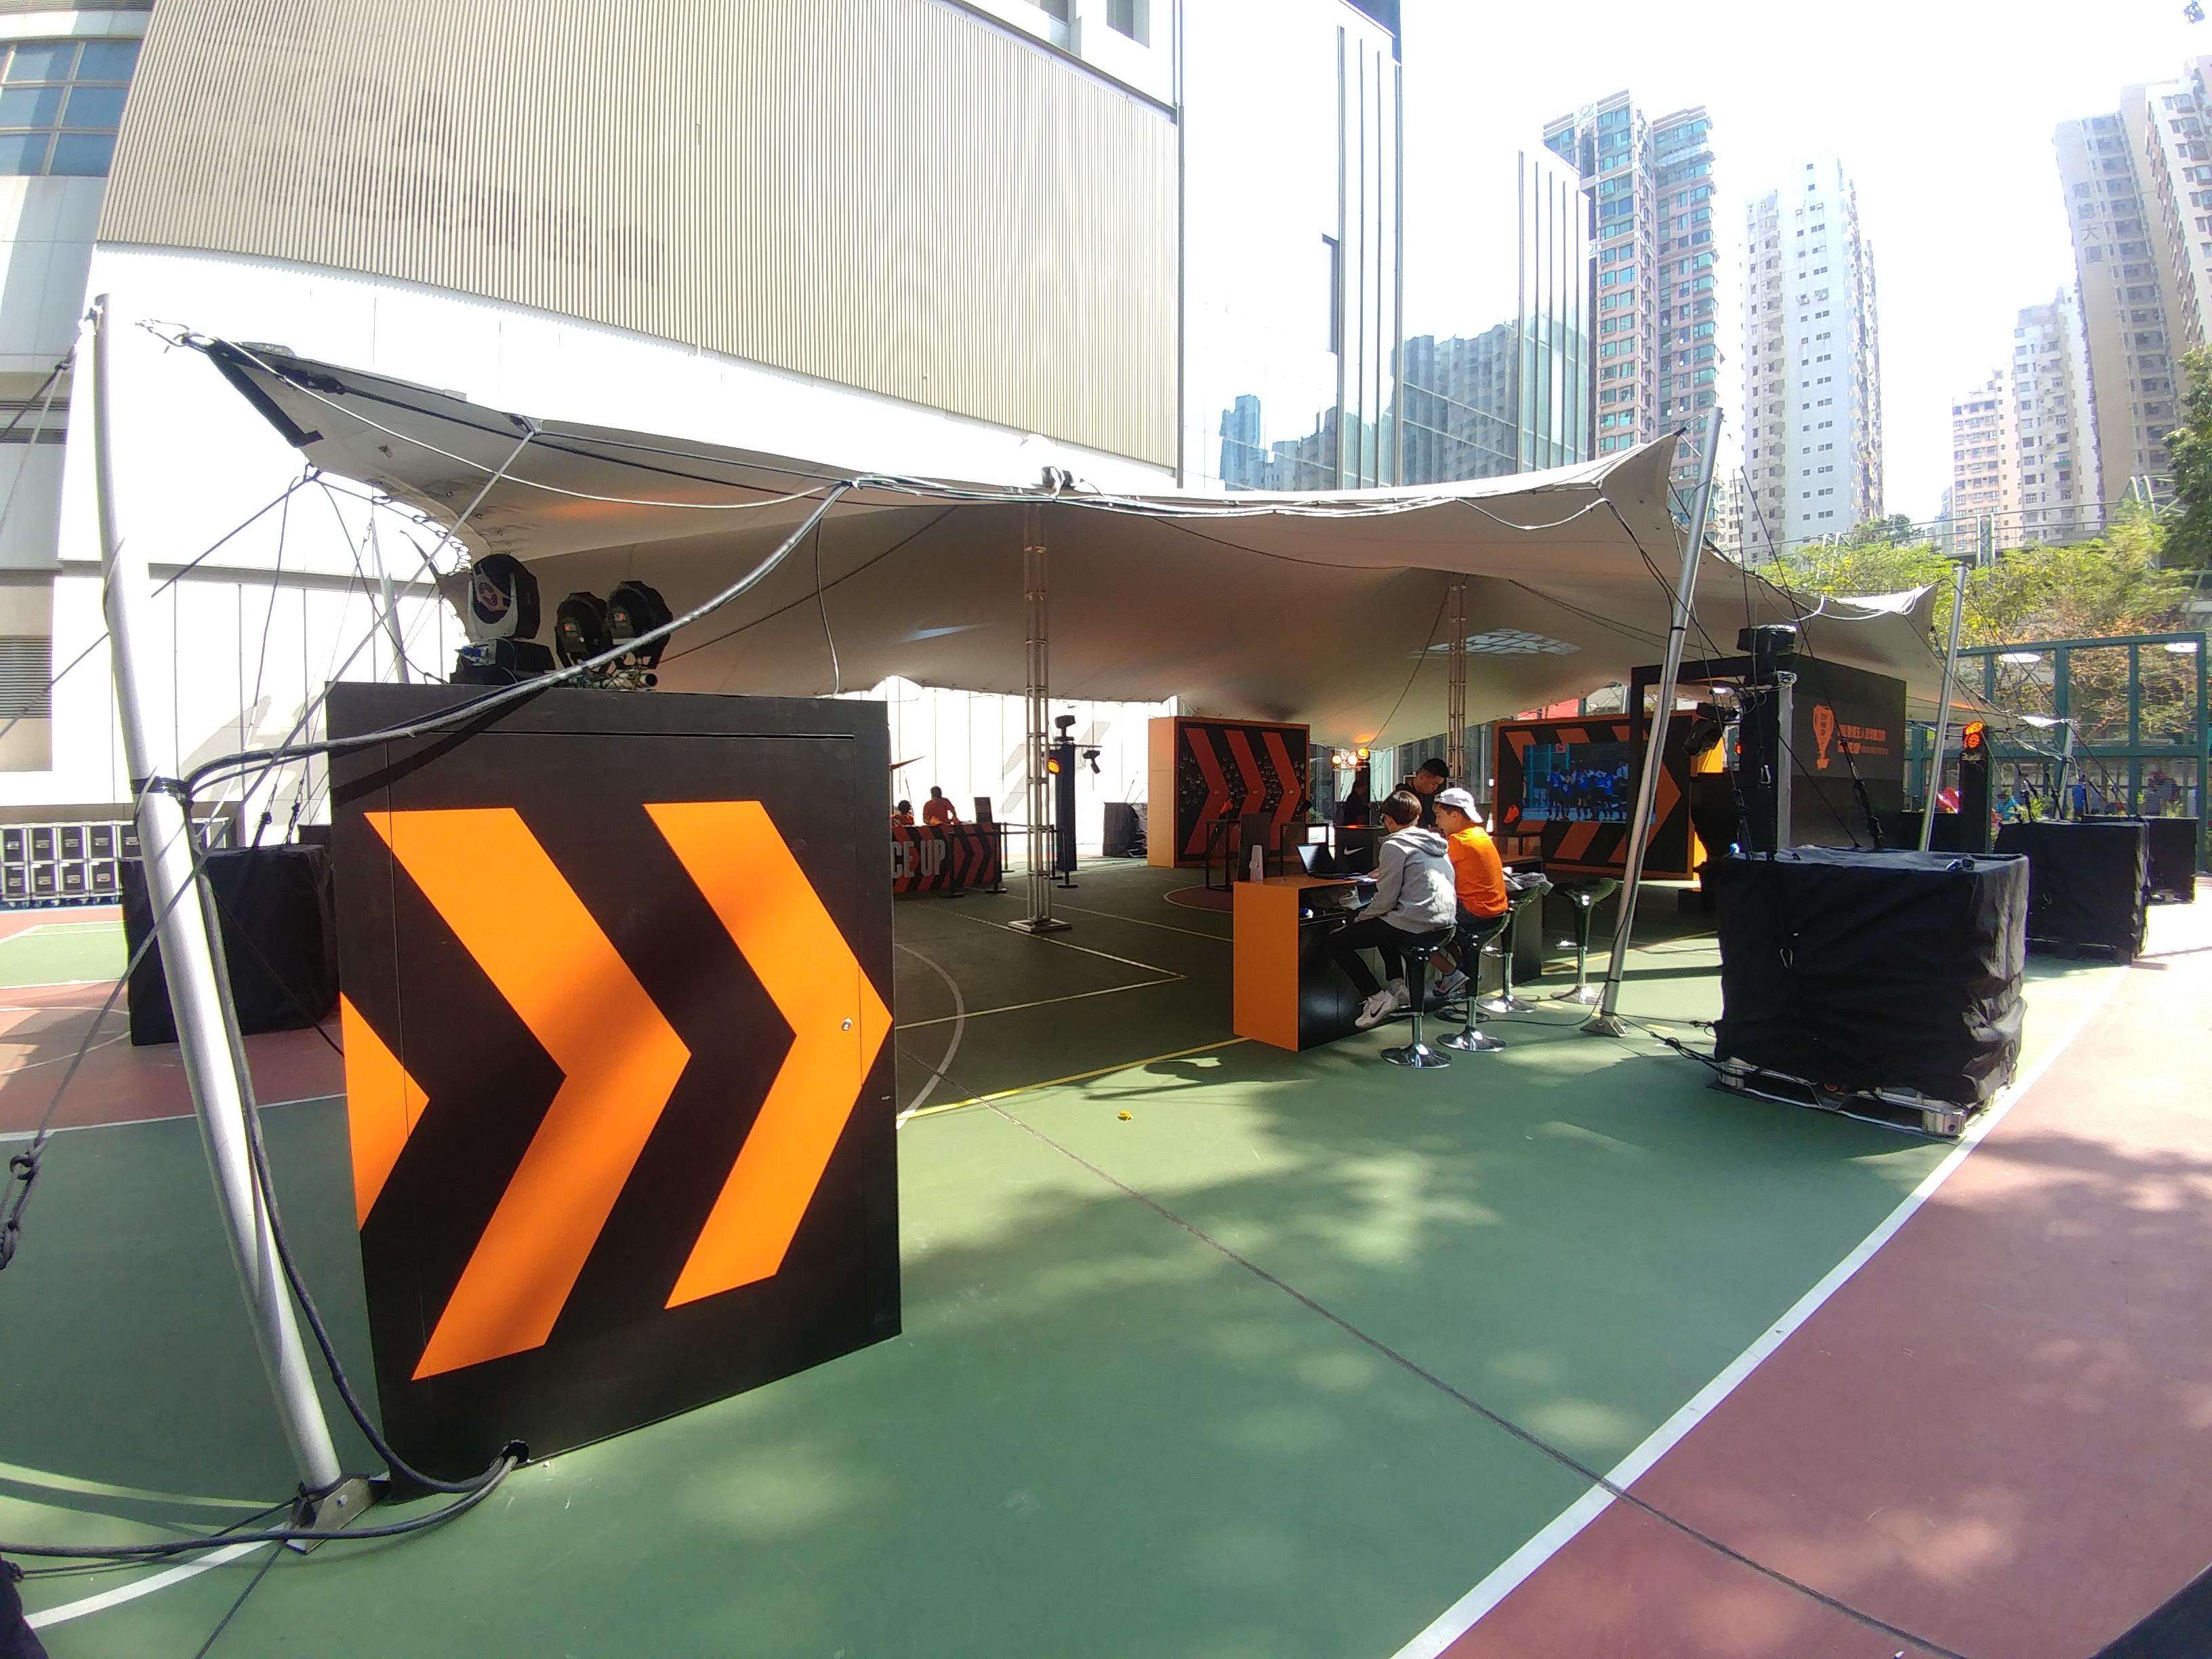 2018 NIKE CUP HONG KONG